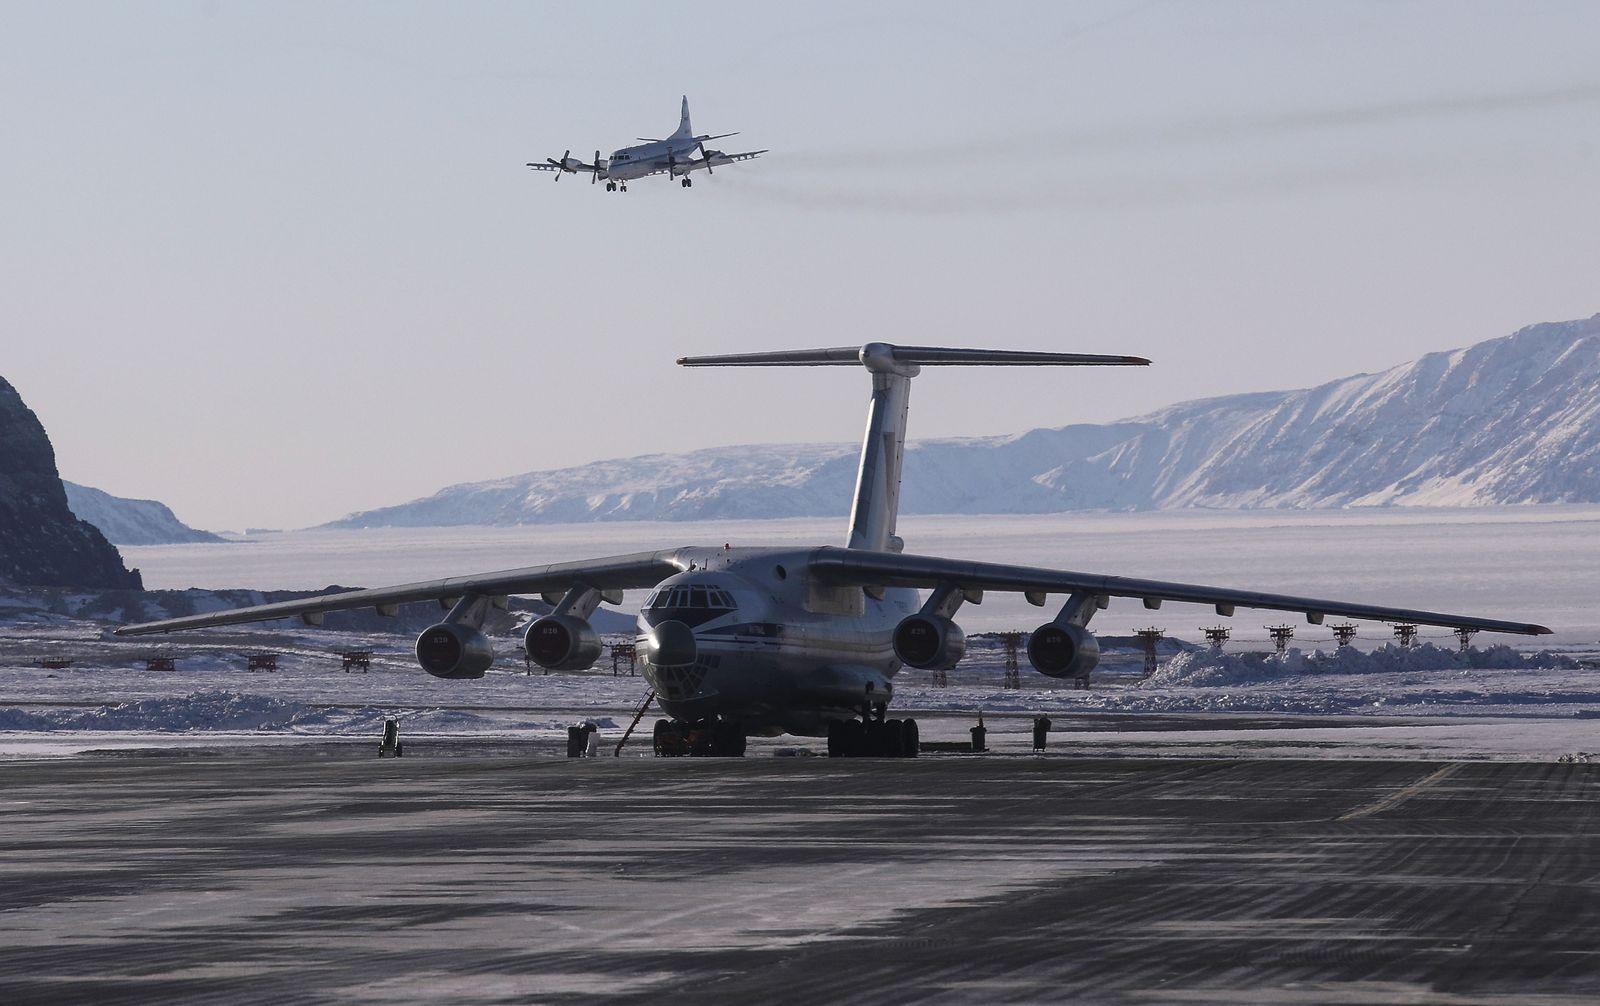 GRL-NASA-CONTINUES-EFFORTS-TO-MONITOR-ARCTIC-ICE-LOSS-WITH-RESEA